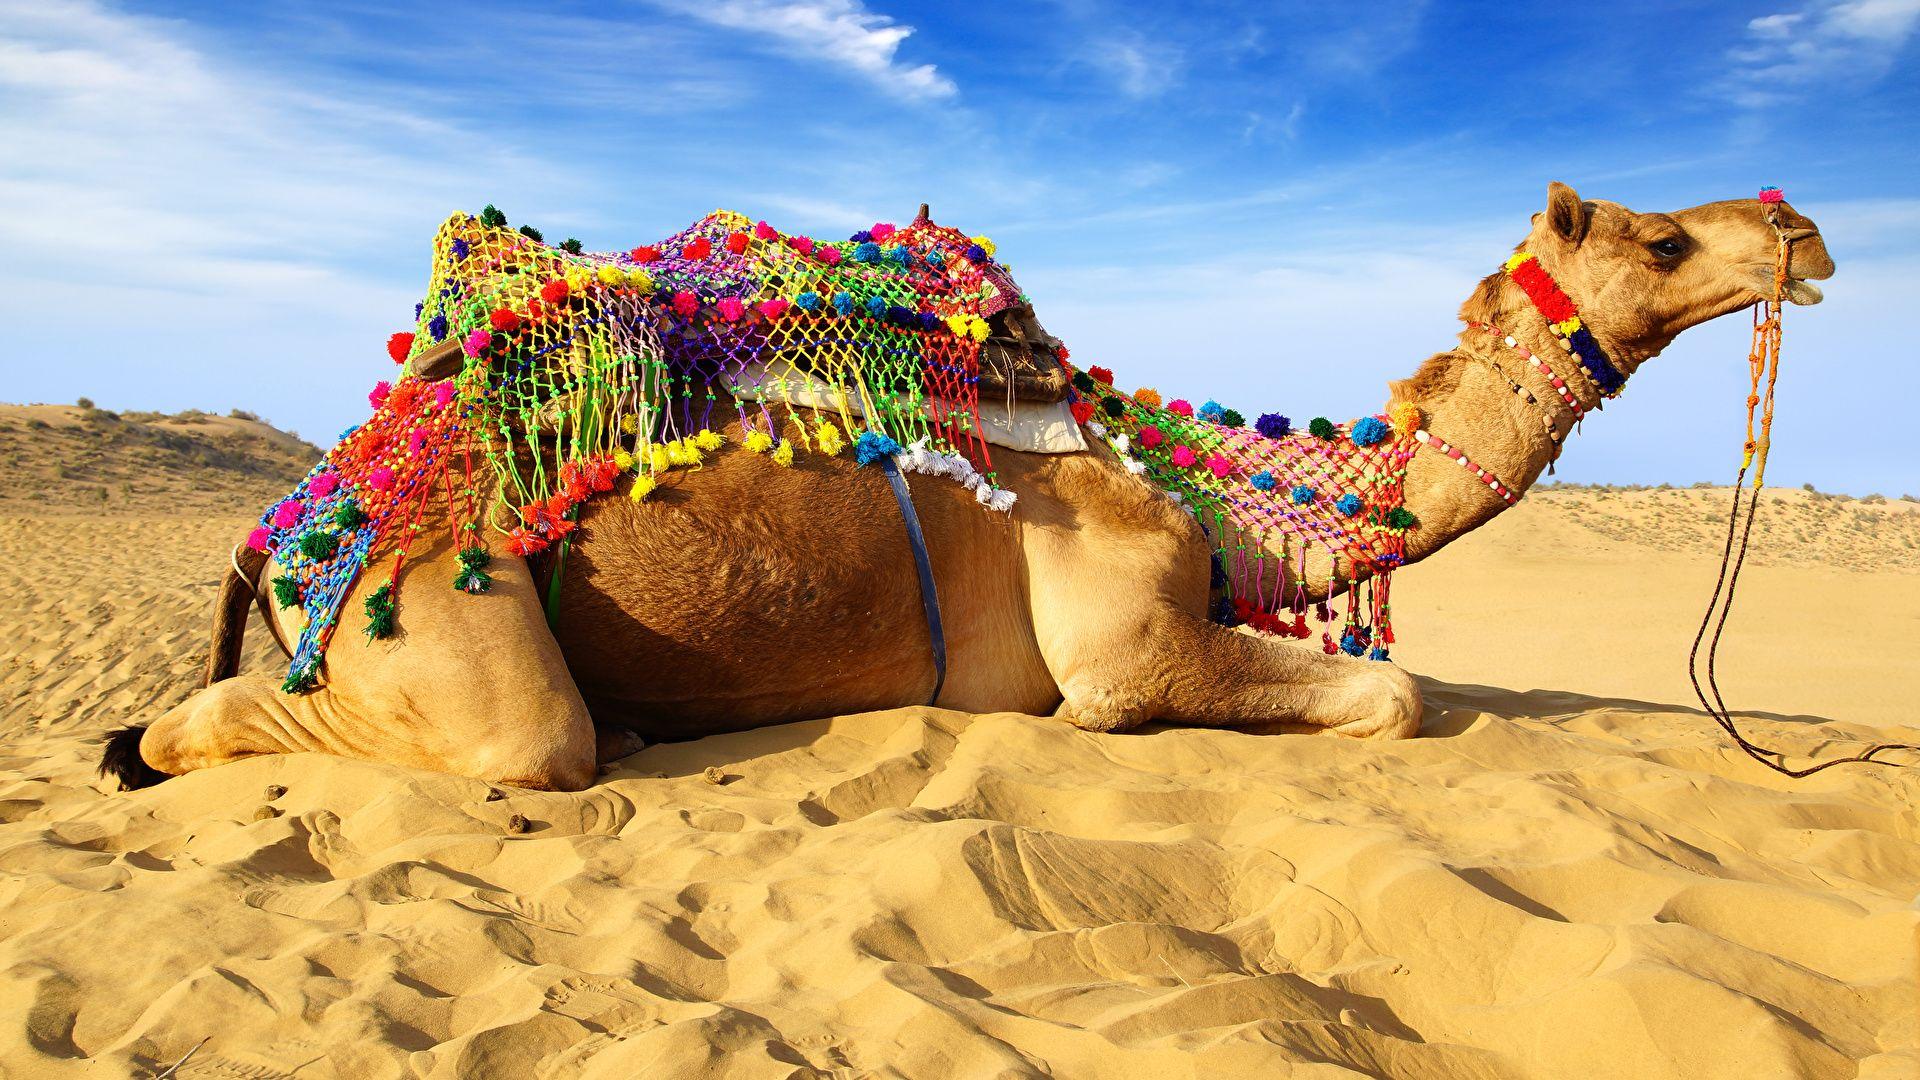 Camel Beautiful Photo